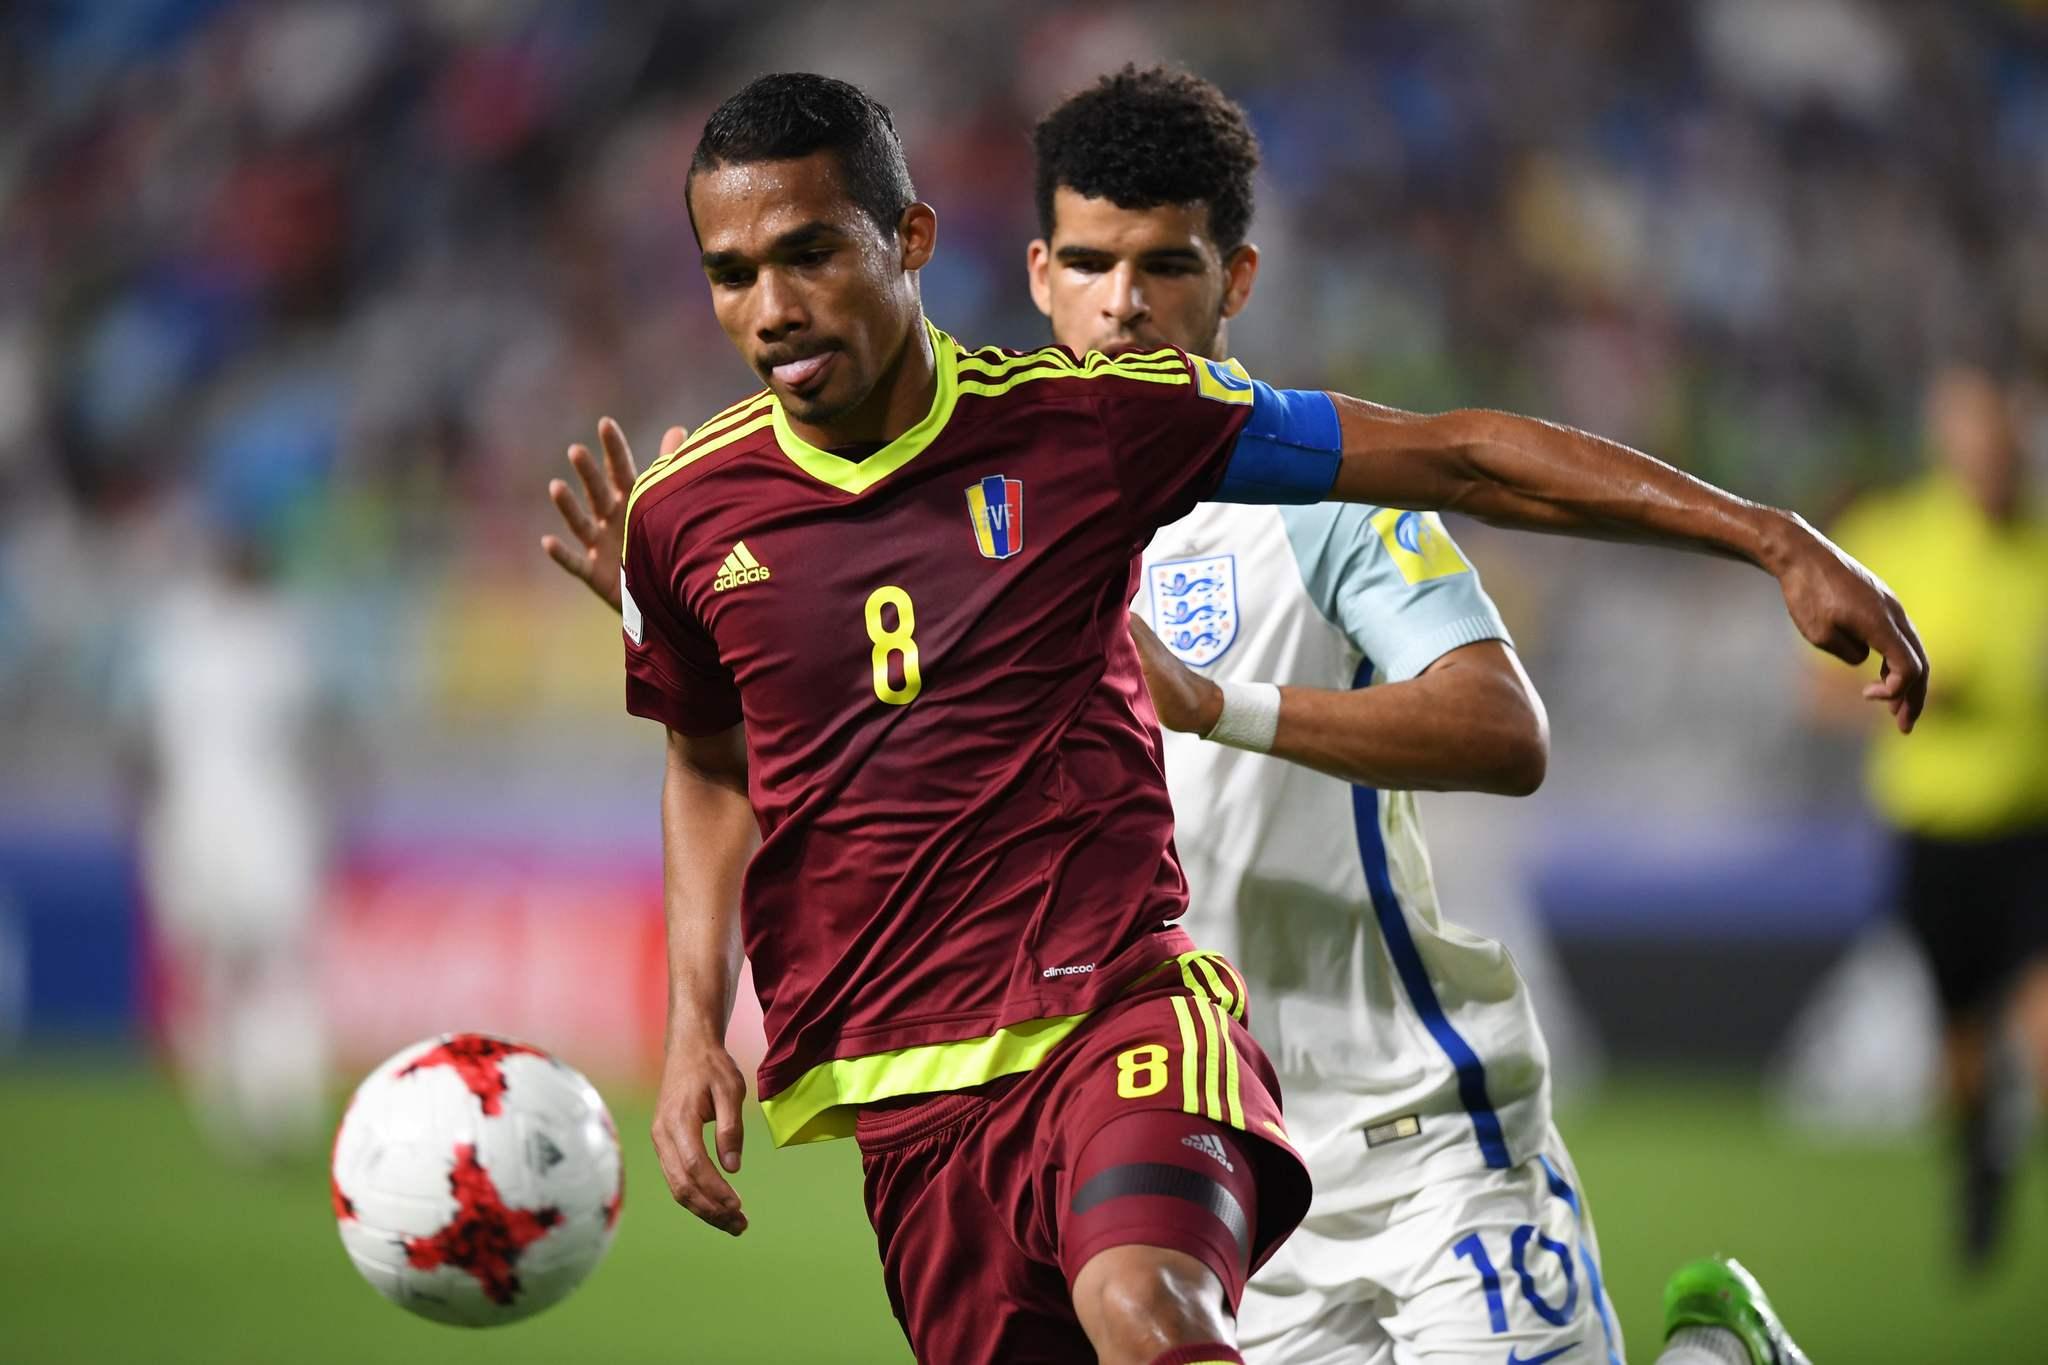 Yangel Herrera protege el balón ante Solanke.